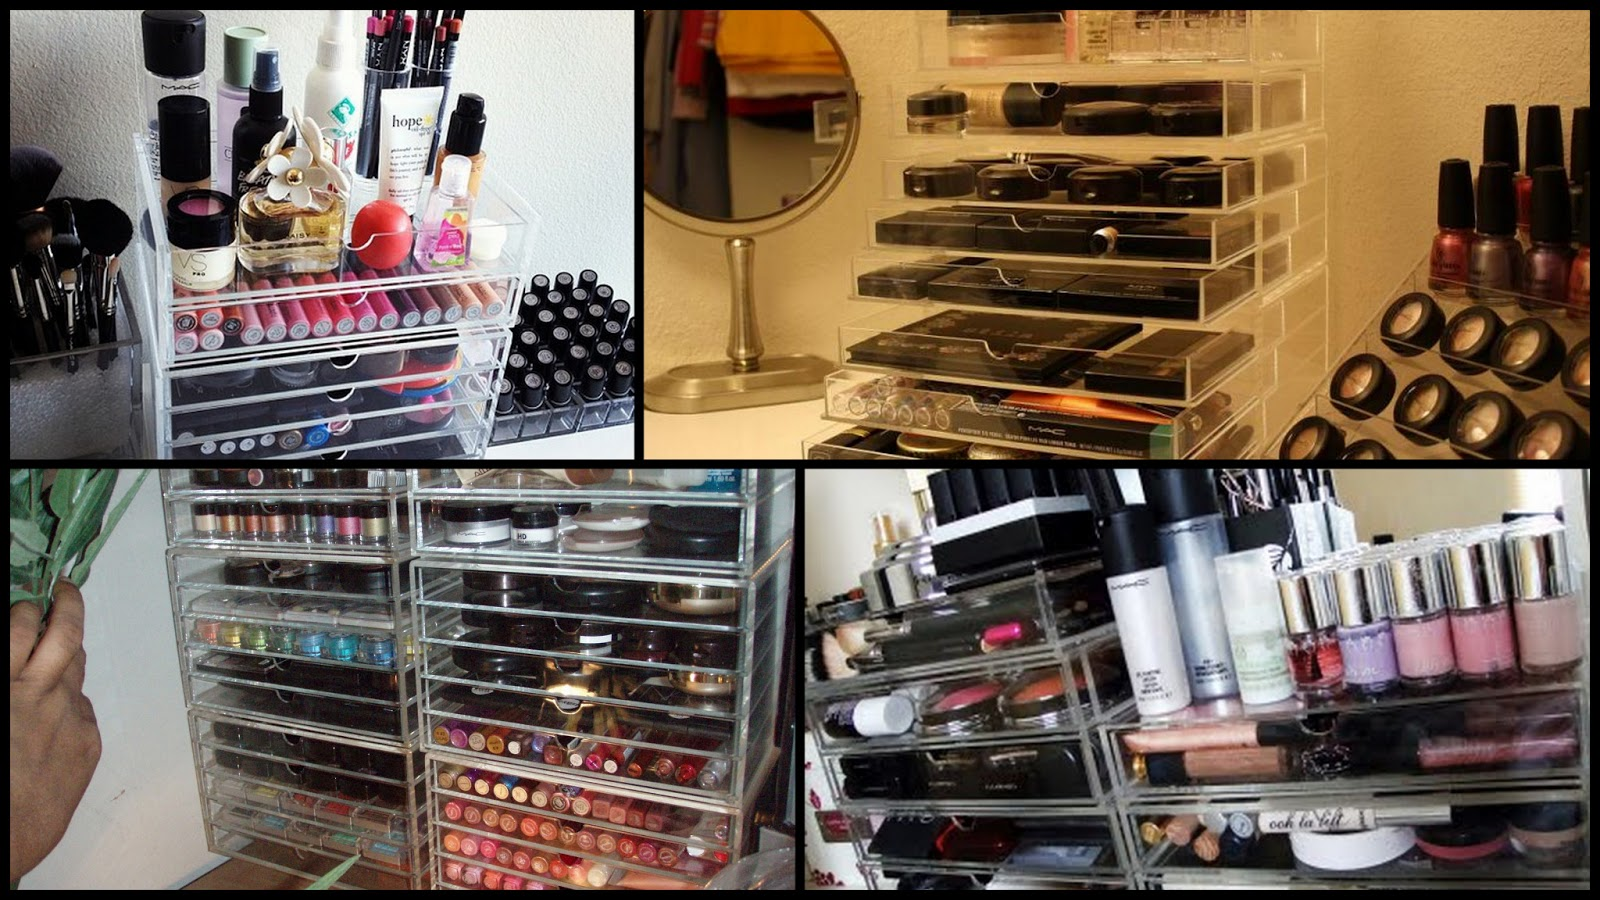 le boudoir d 39 ines comment ranger son make up quand on commence avoir une collection. Black Bedroom Furniture Sets. Home Design Ideas